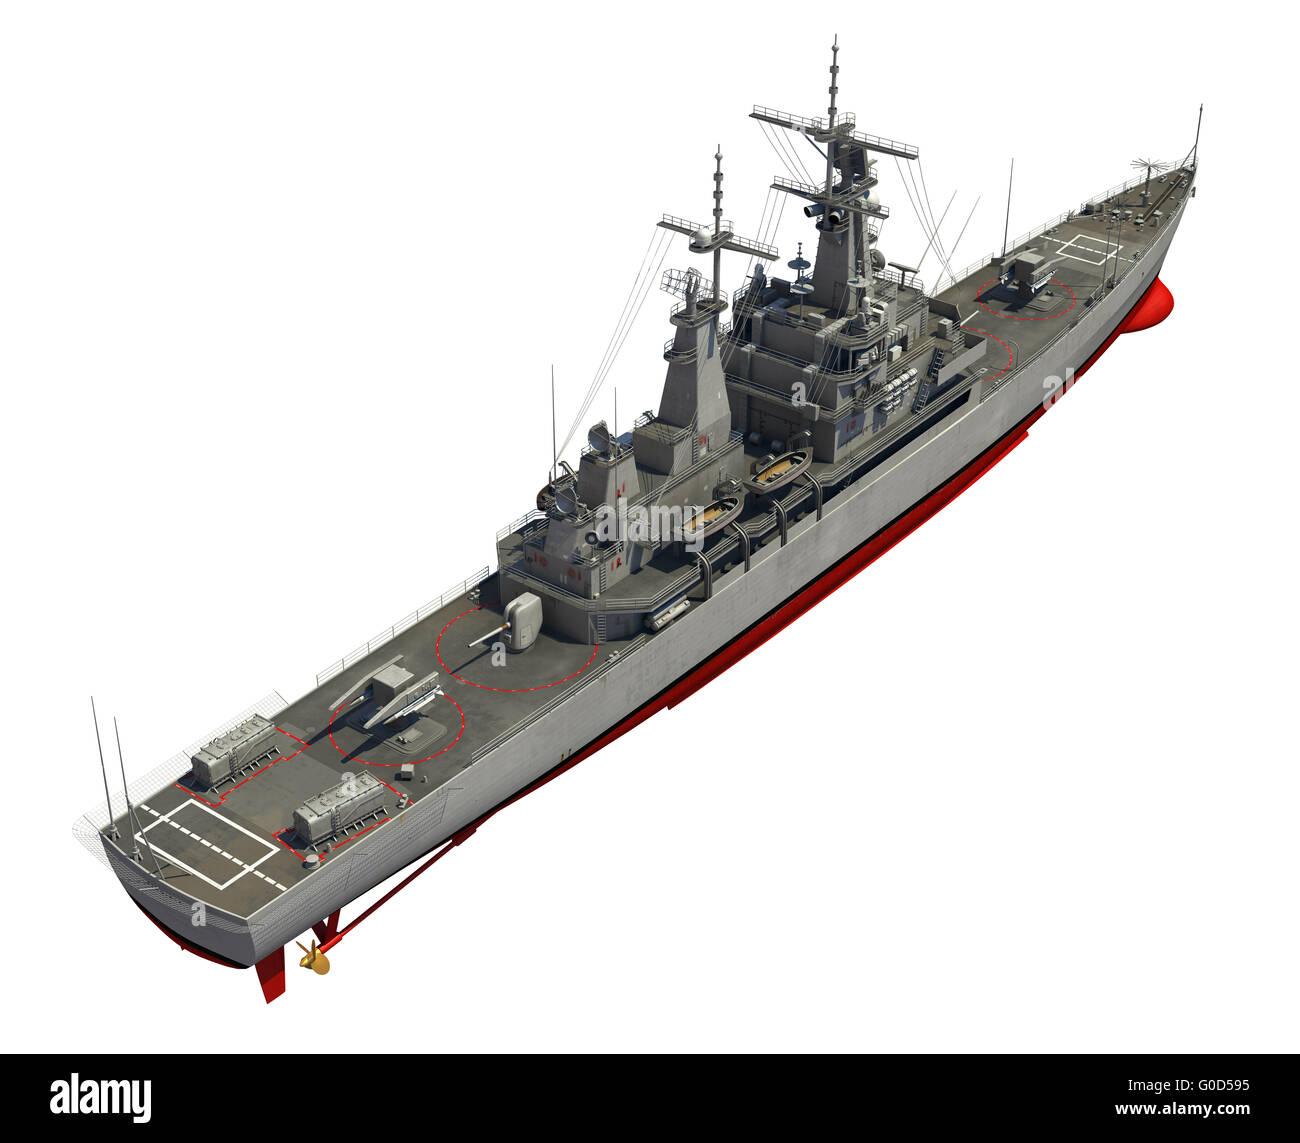 Modern Warship Over White Background. 3D Illustration. - Stock Image